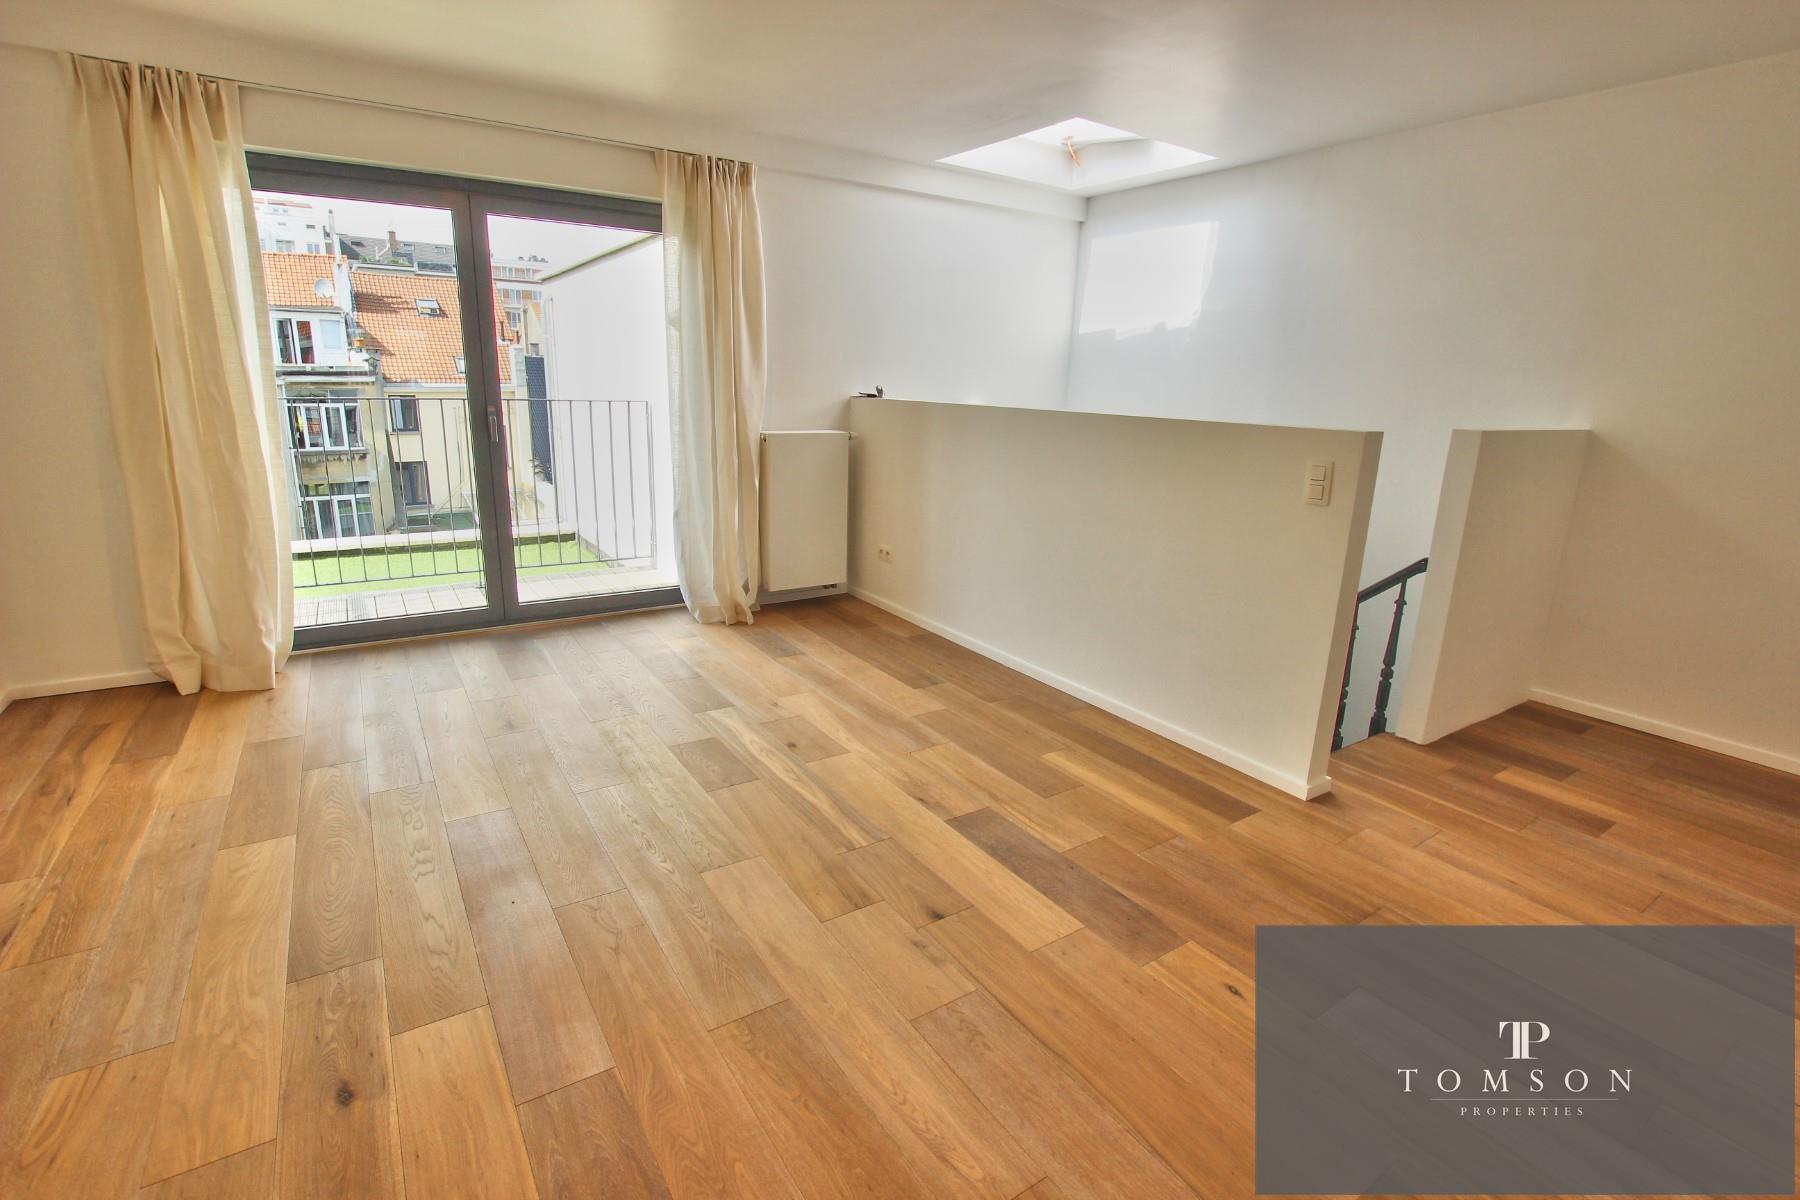 Appartement - Woluwe-Saint-Lambert - #4244113-1